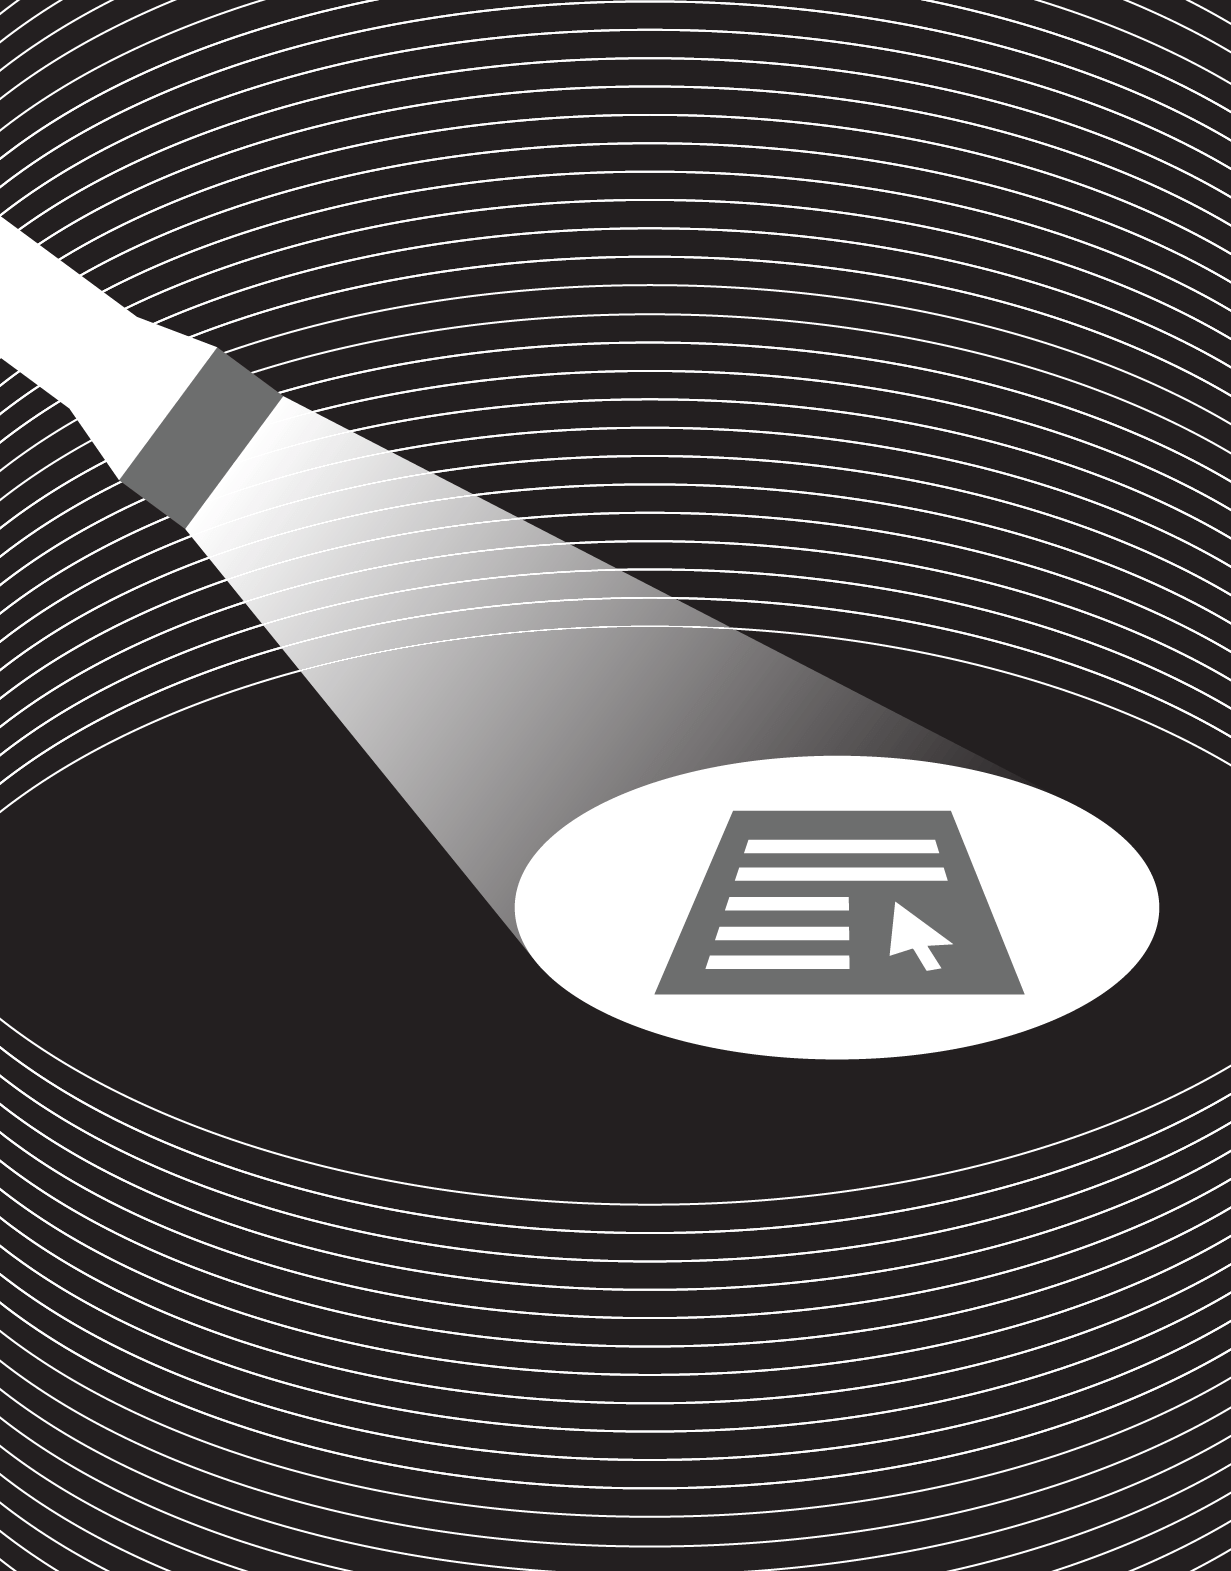 Illustrated flashlight shining on a form